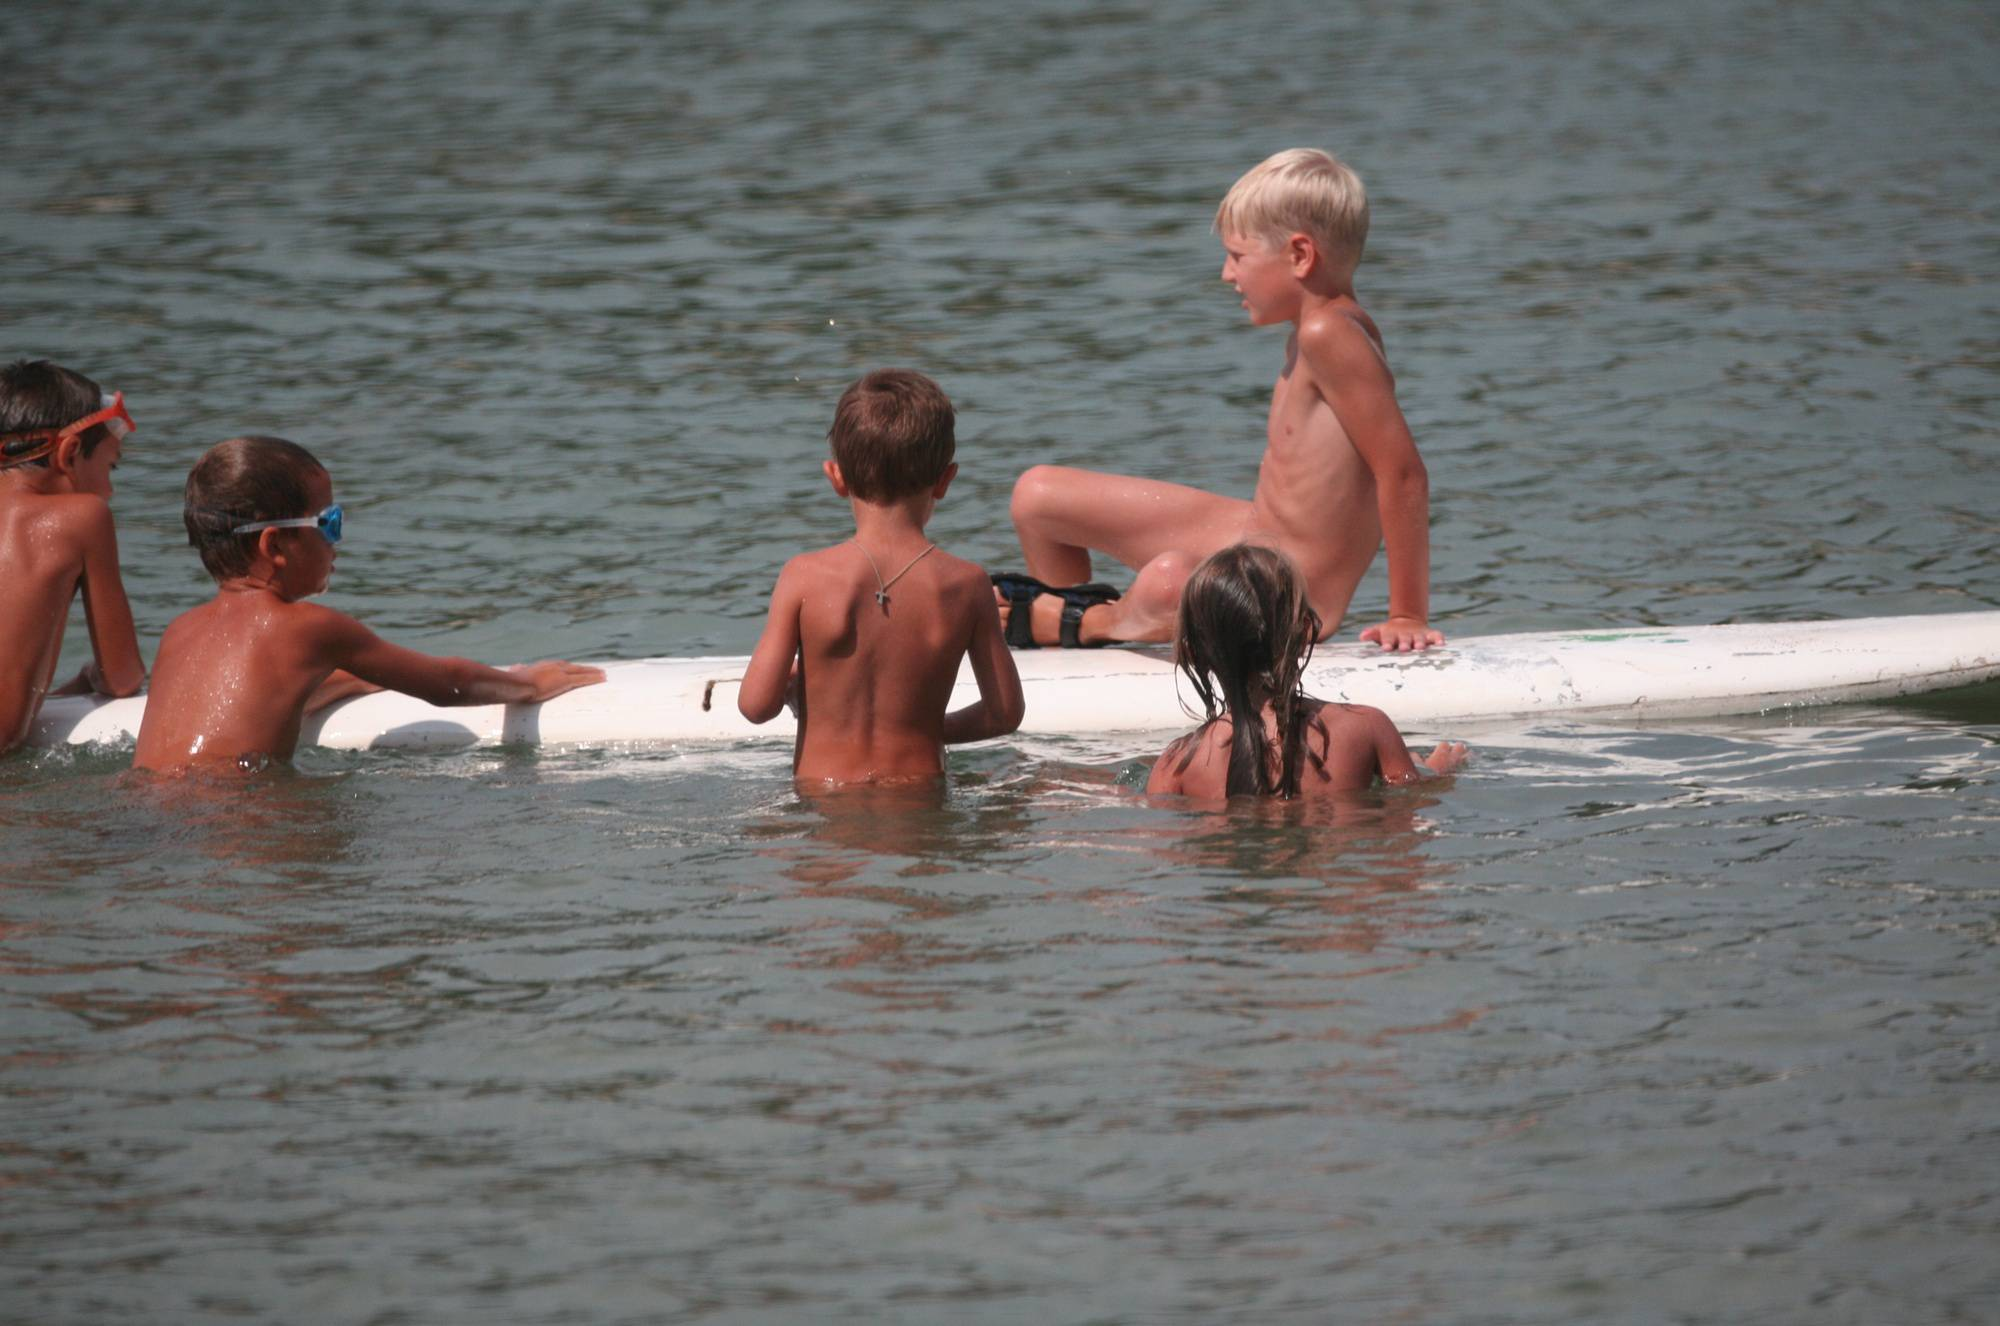 Several Kids On Surfboard - 1